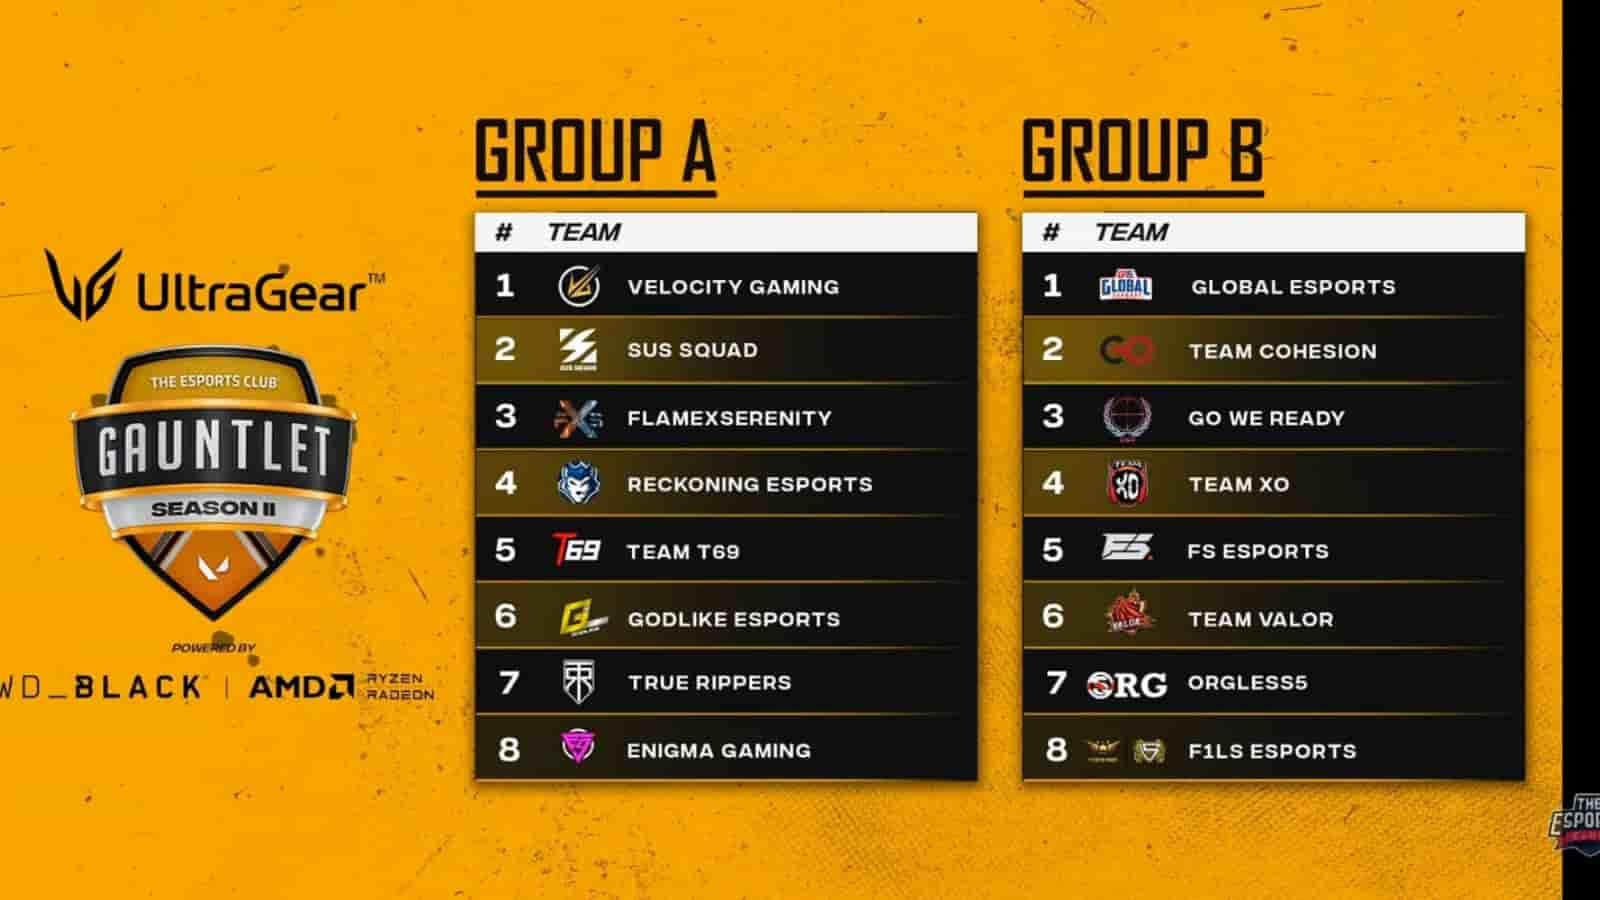 Valorant Tec Gauntlet Season 2 Announces Top 16 Teams Participating and Group Draws